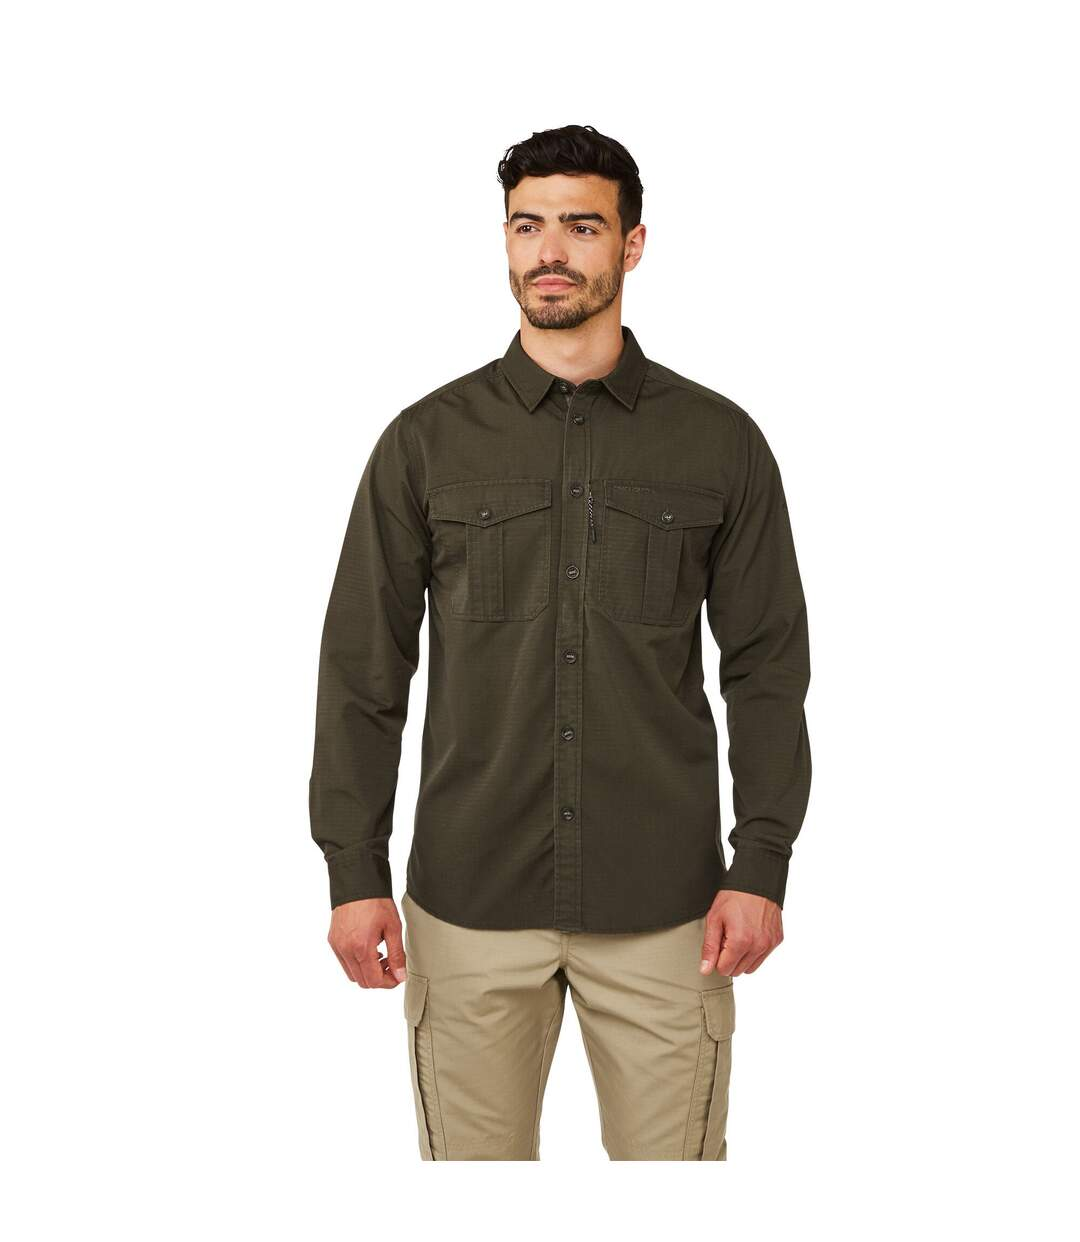 Craghoppers Mens Kiwi Ripstop Long Sleeve Shirt (Woodland Green) - UTCG1217